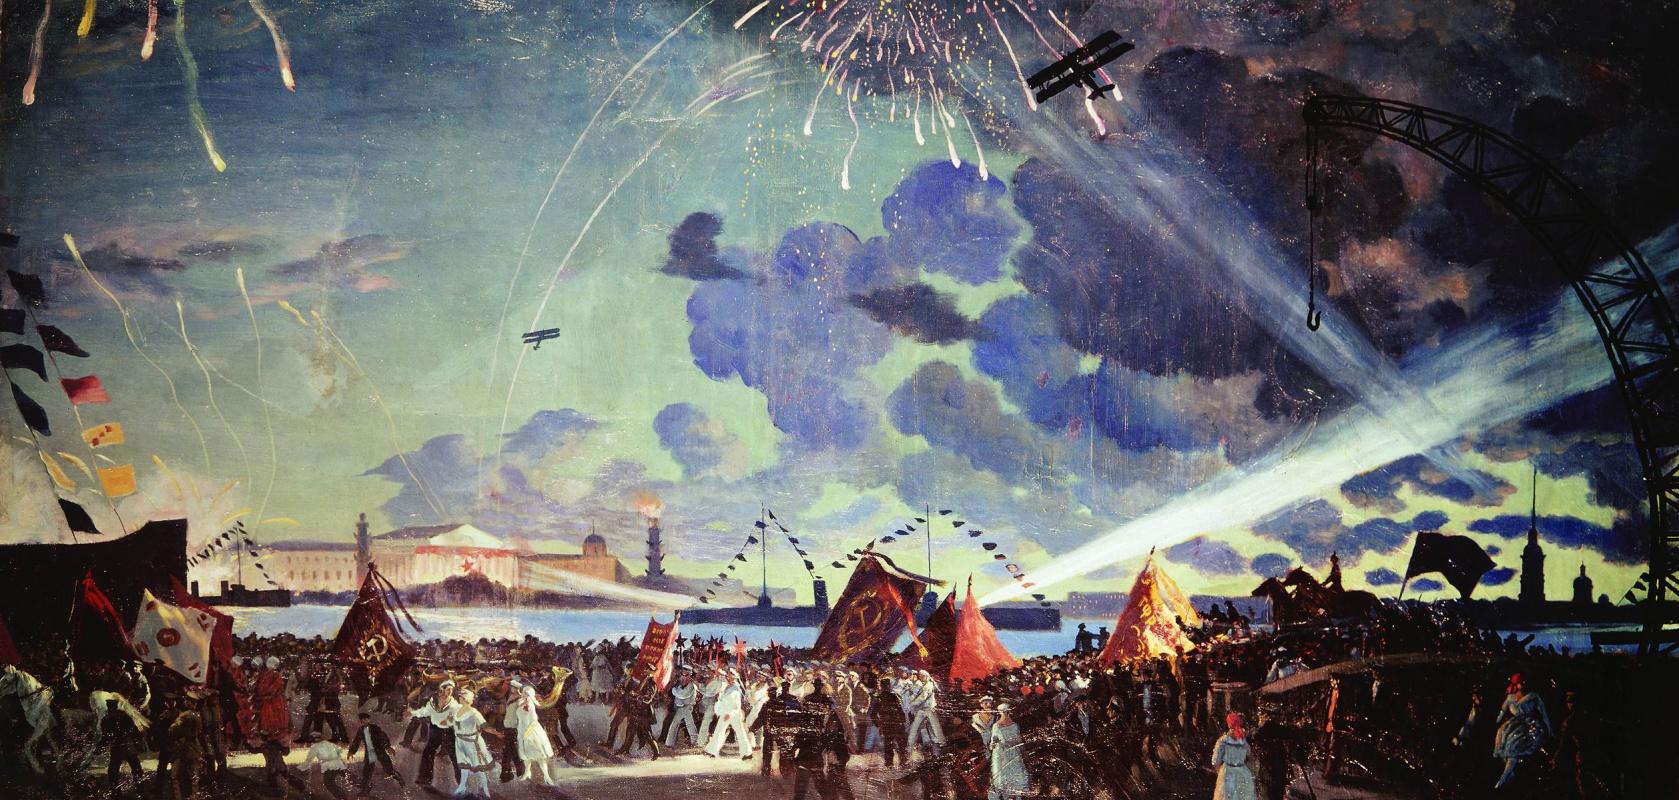 Boris Mikhailovich Kustodiev. Night celebration on the Neva river